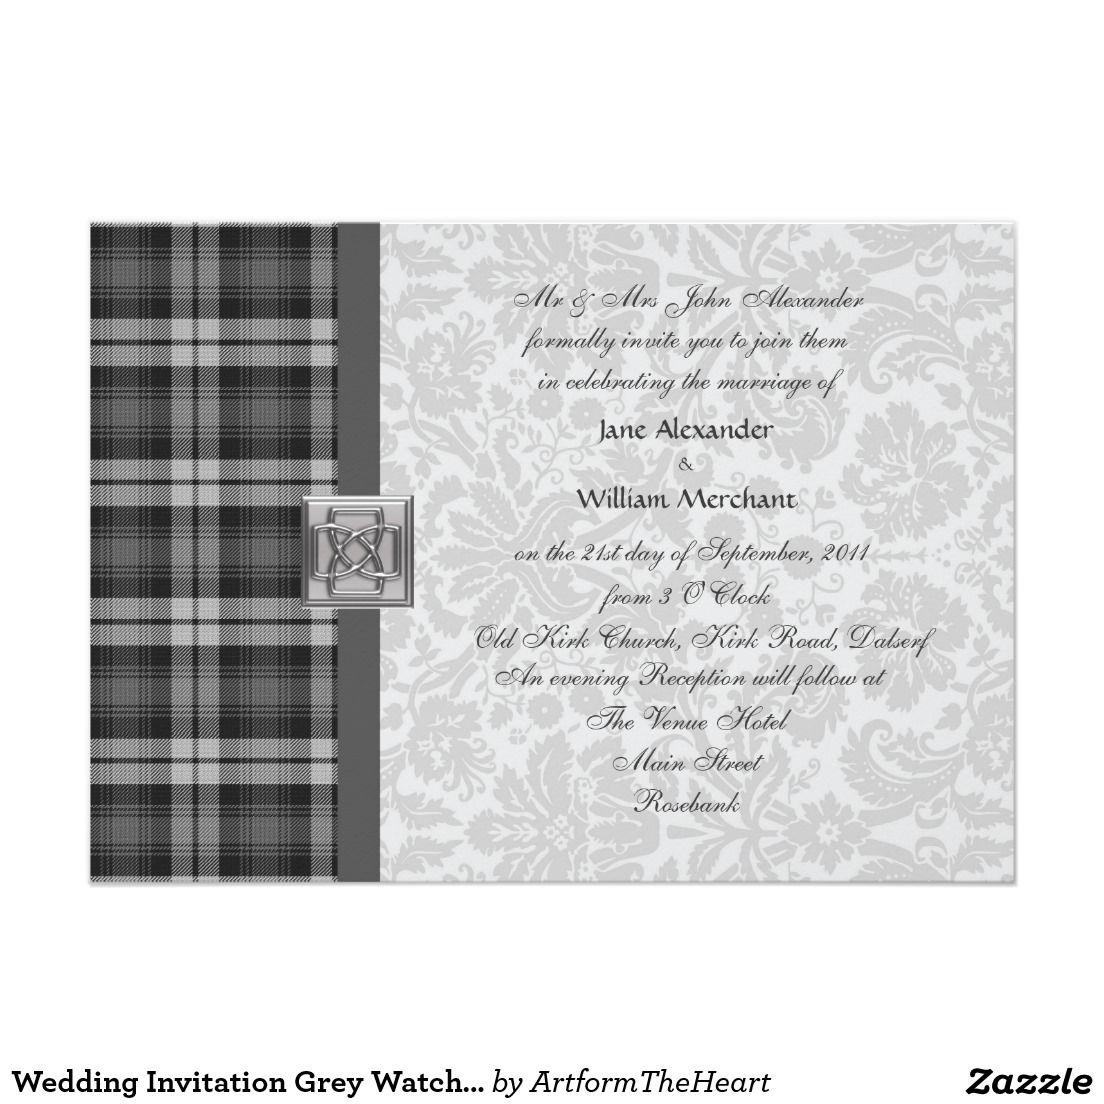 Wedding Invitation Grey Watch Tartan And Damask Damasks And Wedding